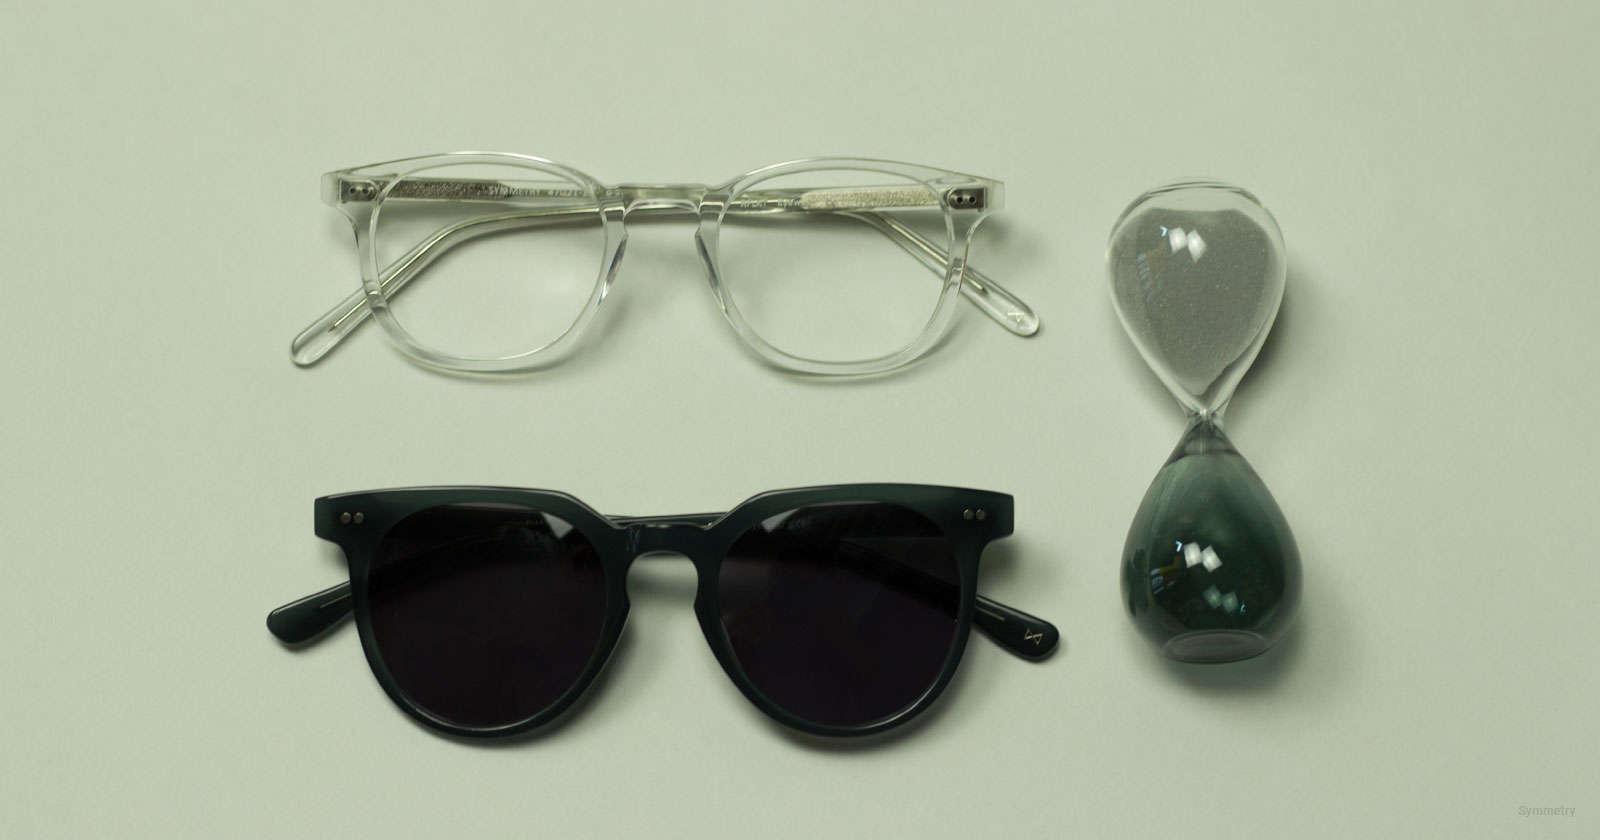 dfb425df65db6 Single Vision Transition Lenses 101